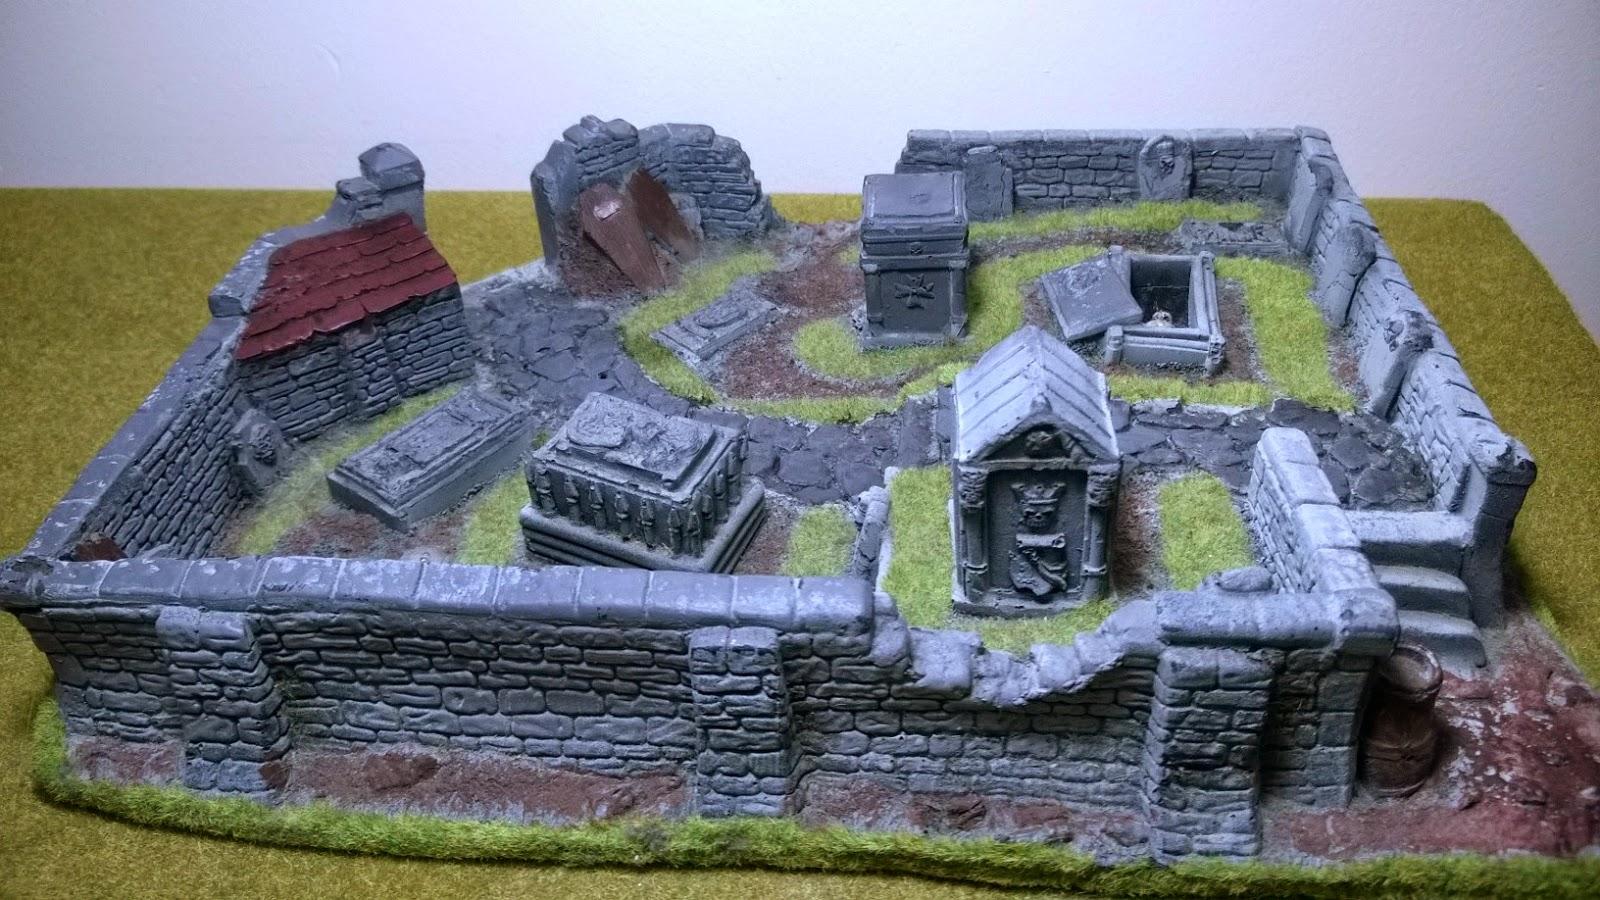 GW graveyard terrain scenery gothic horror